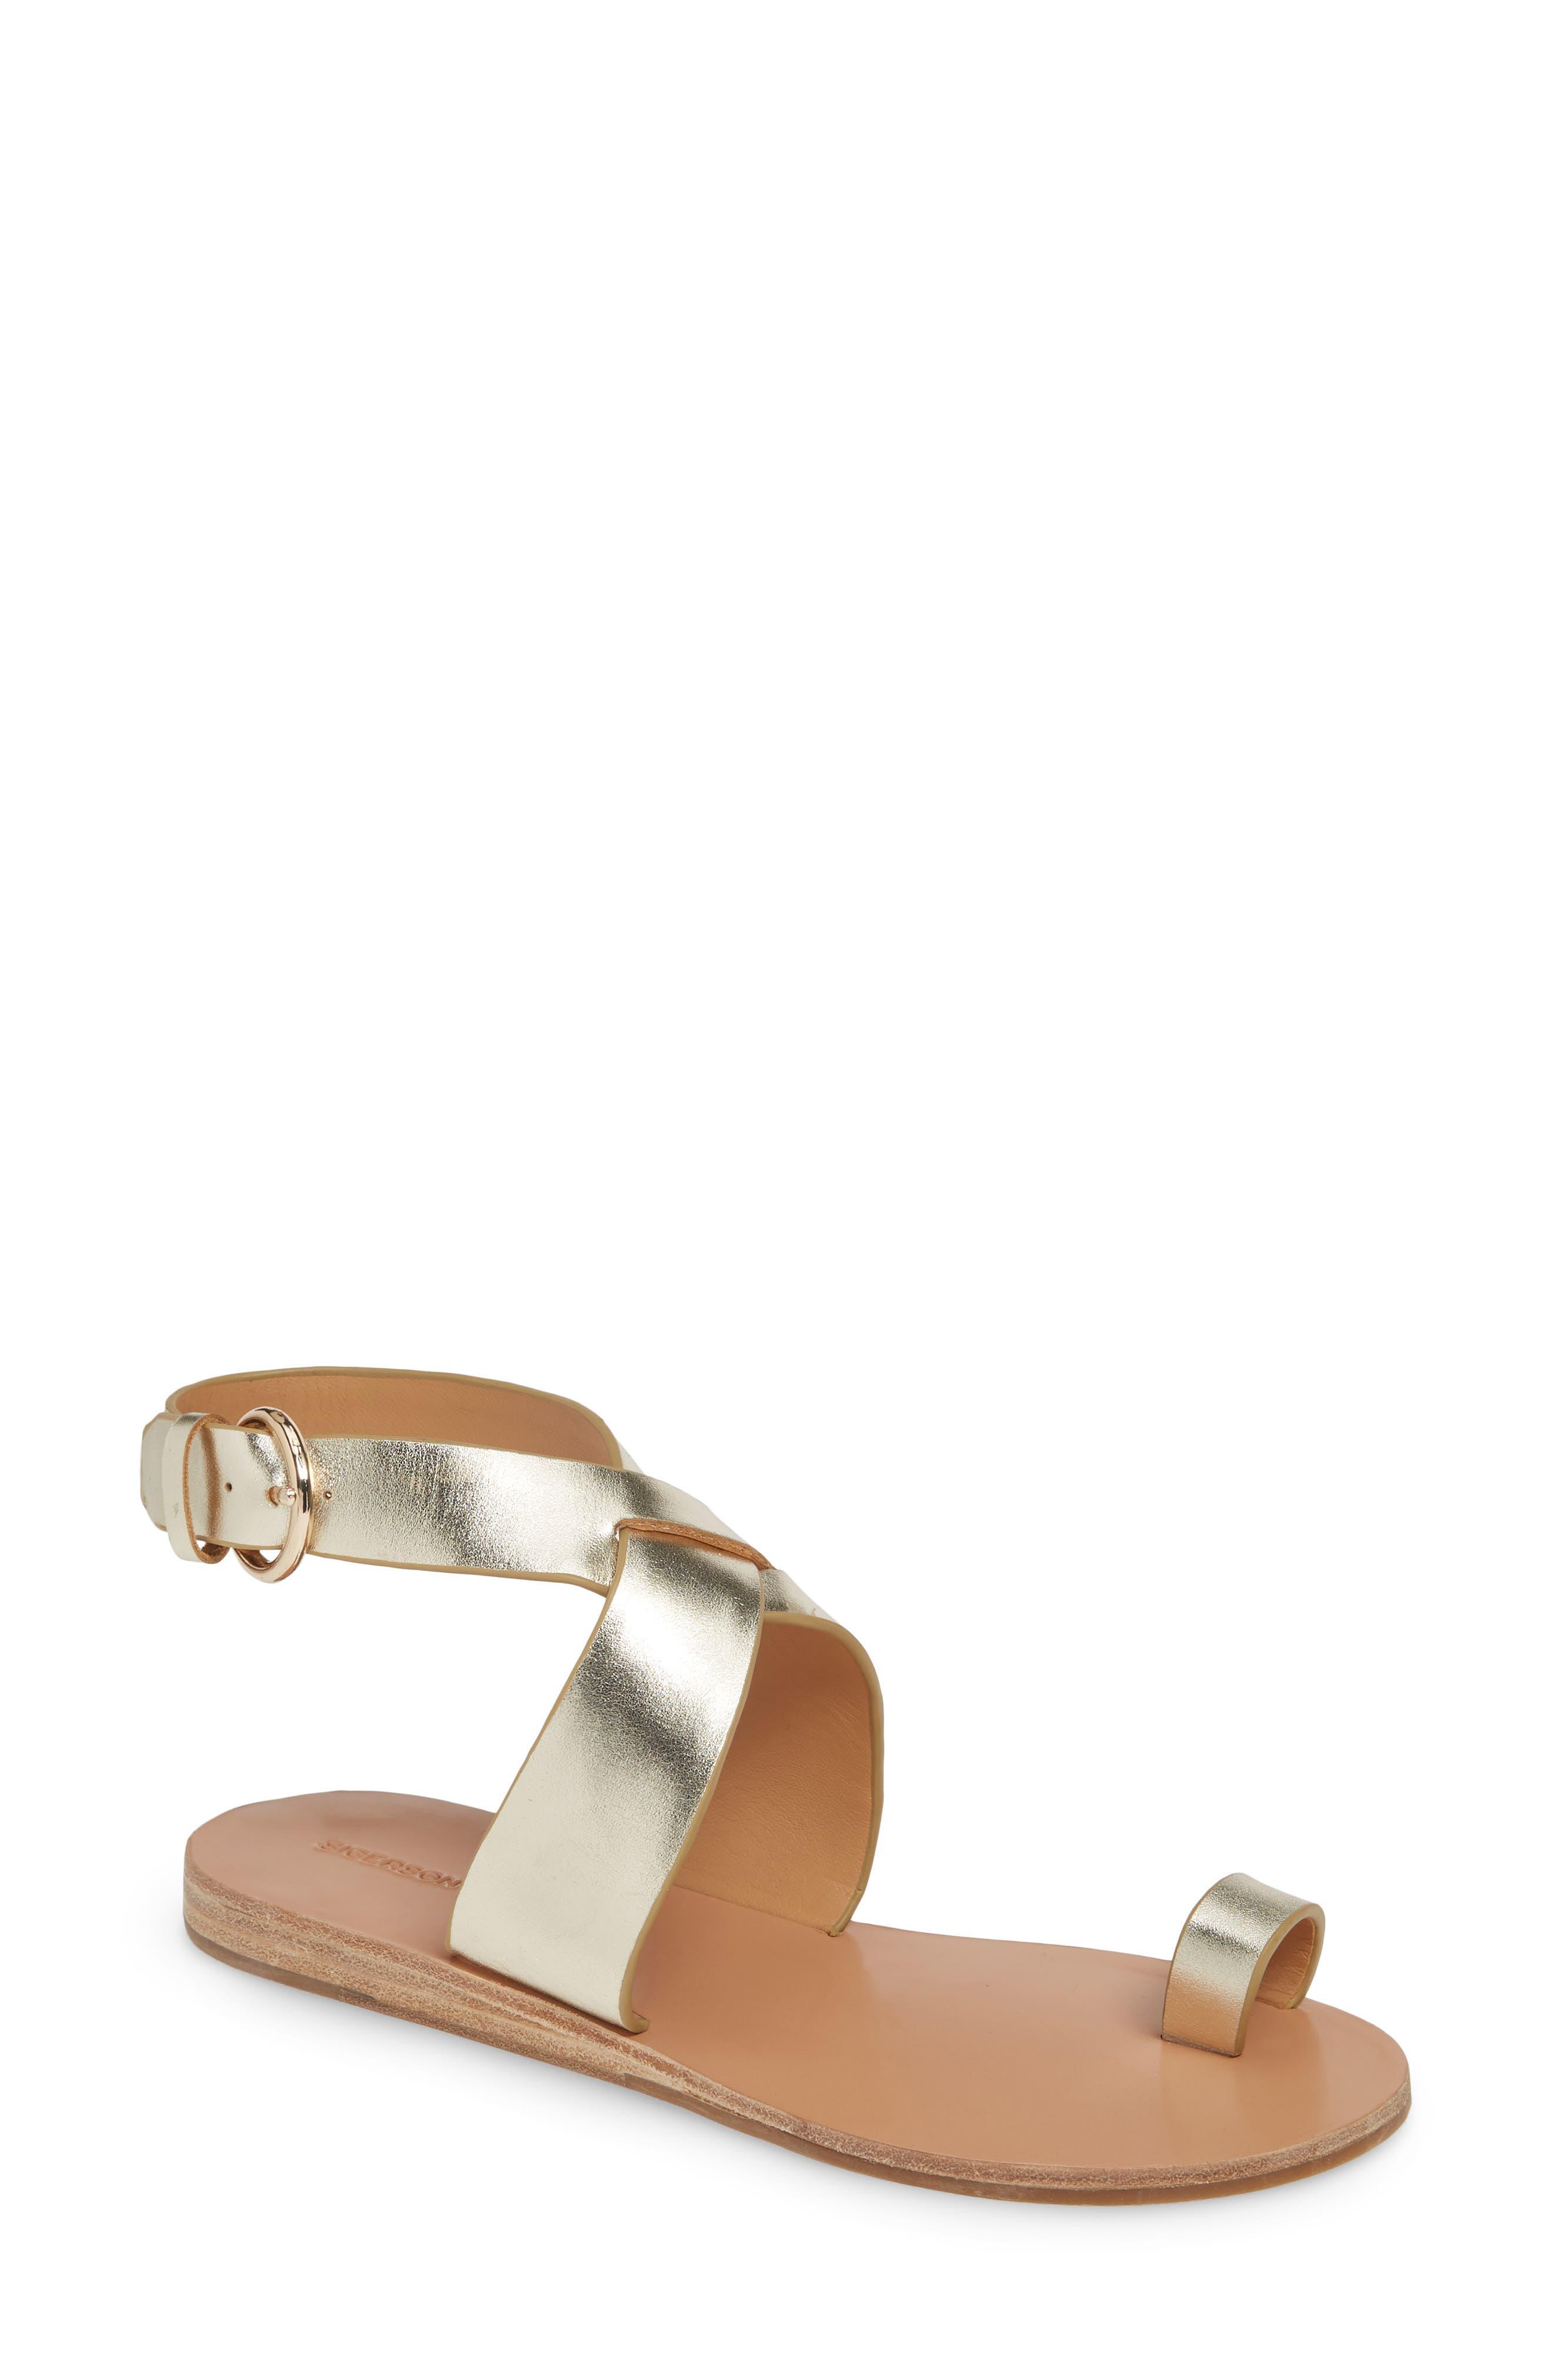 Sigerson Morrison Kyra Toe Loop Sandal Metallic